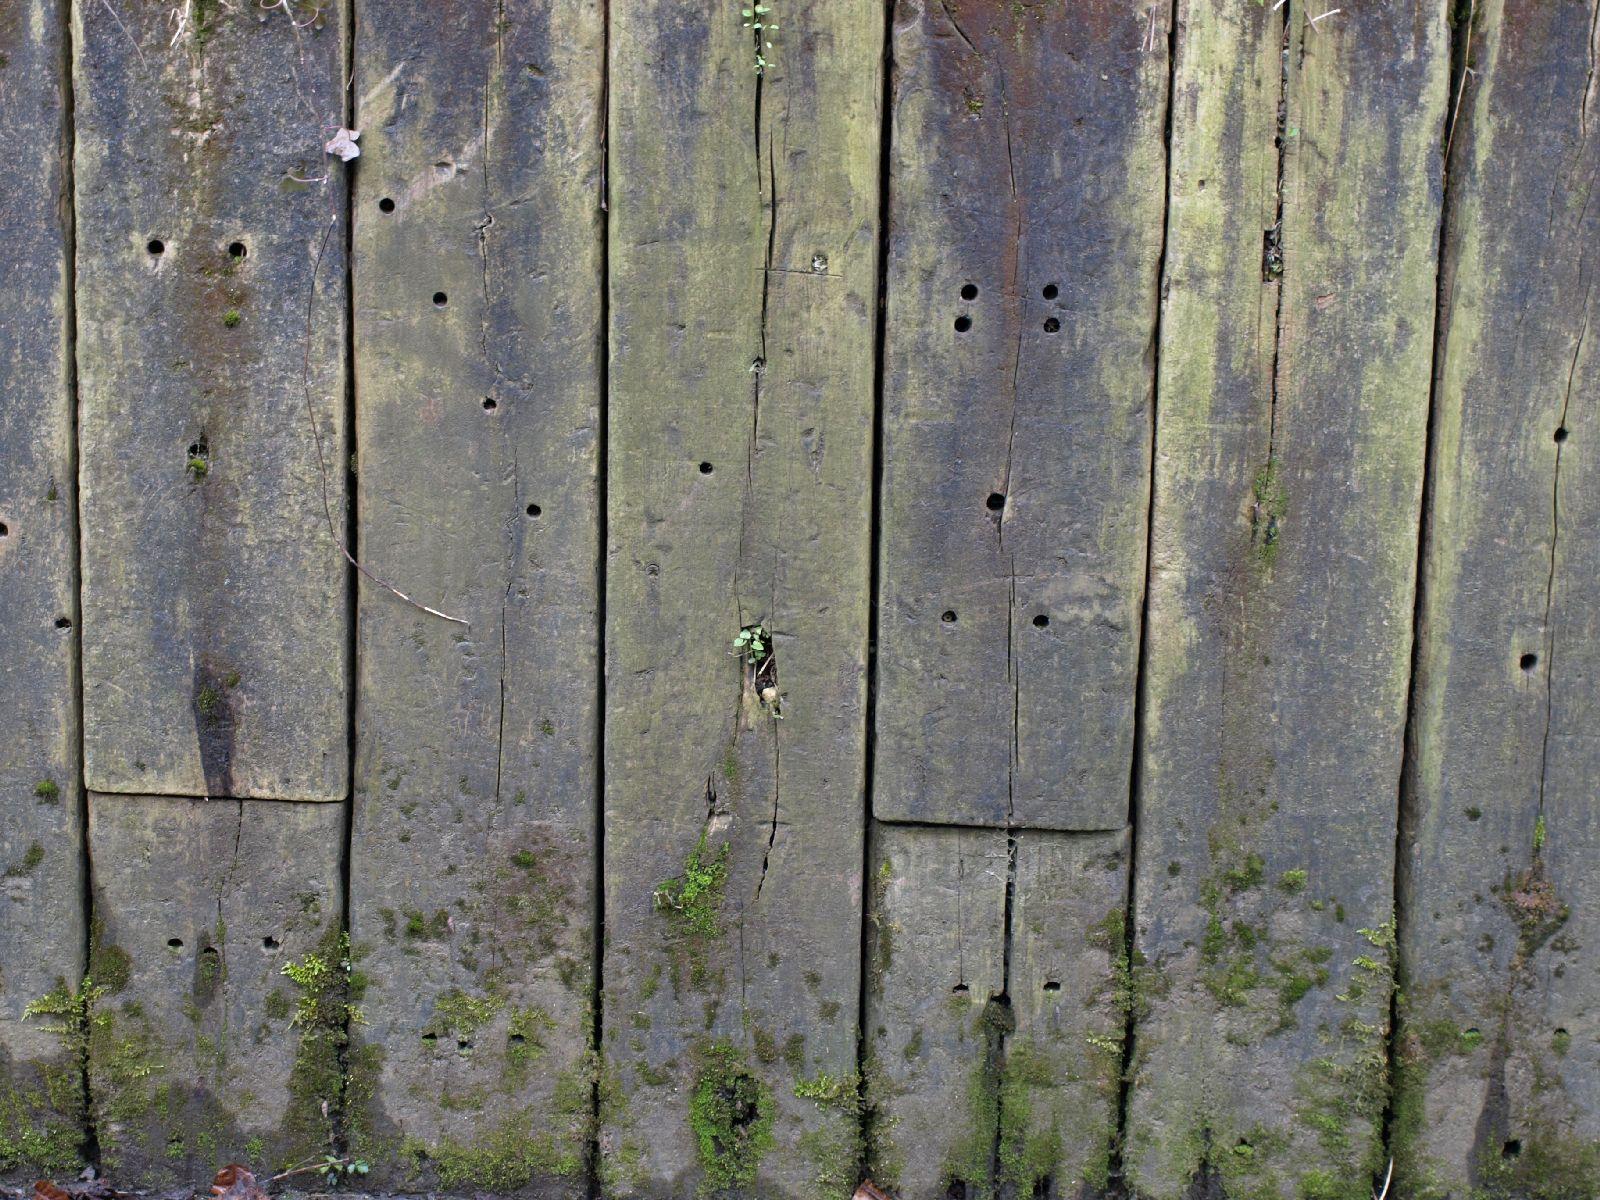 Wood_Texture_A_P4201431